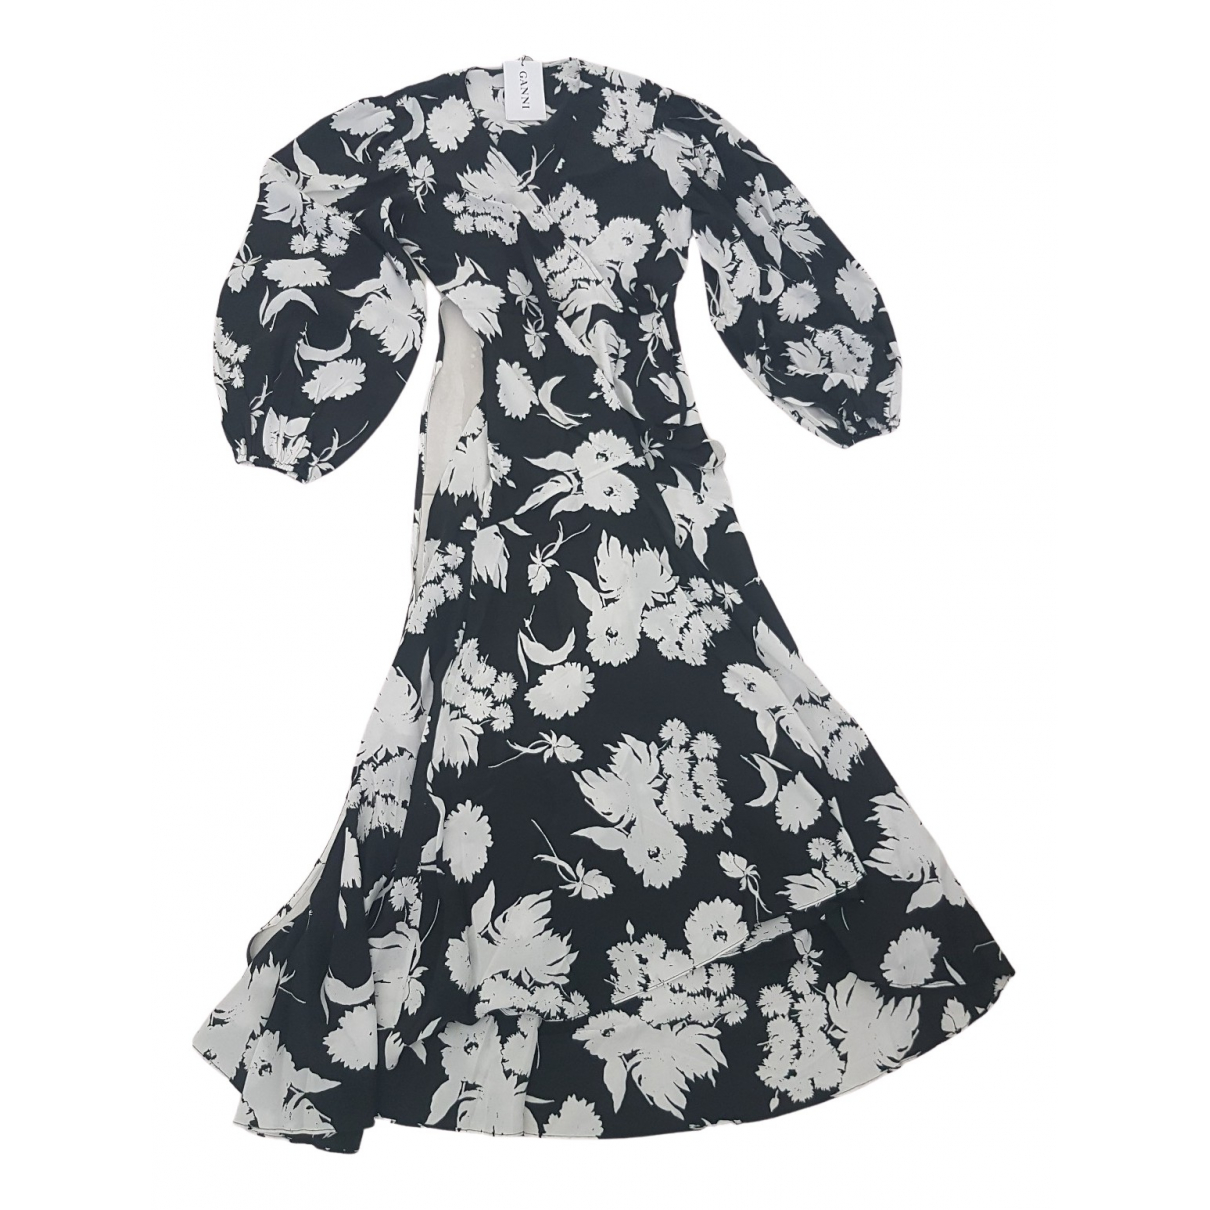 Ganni Spring Summer 2020 Black Silk dress for Women 36 FR